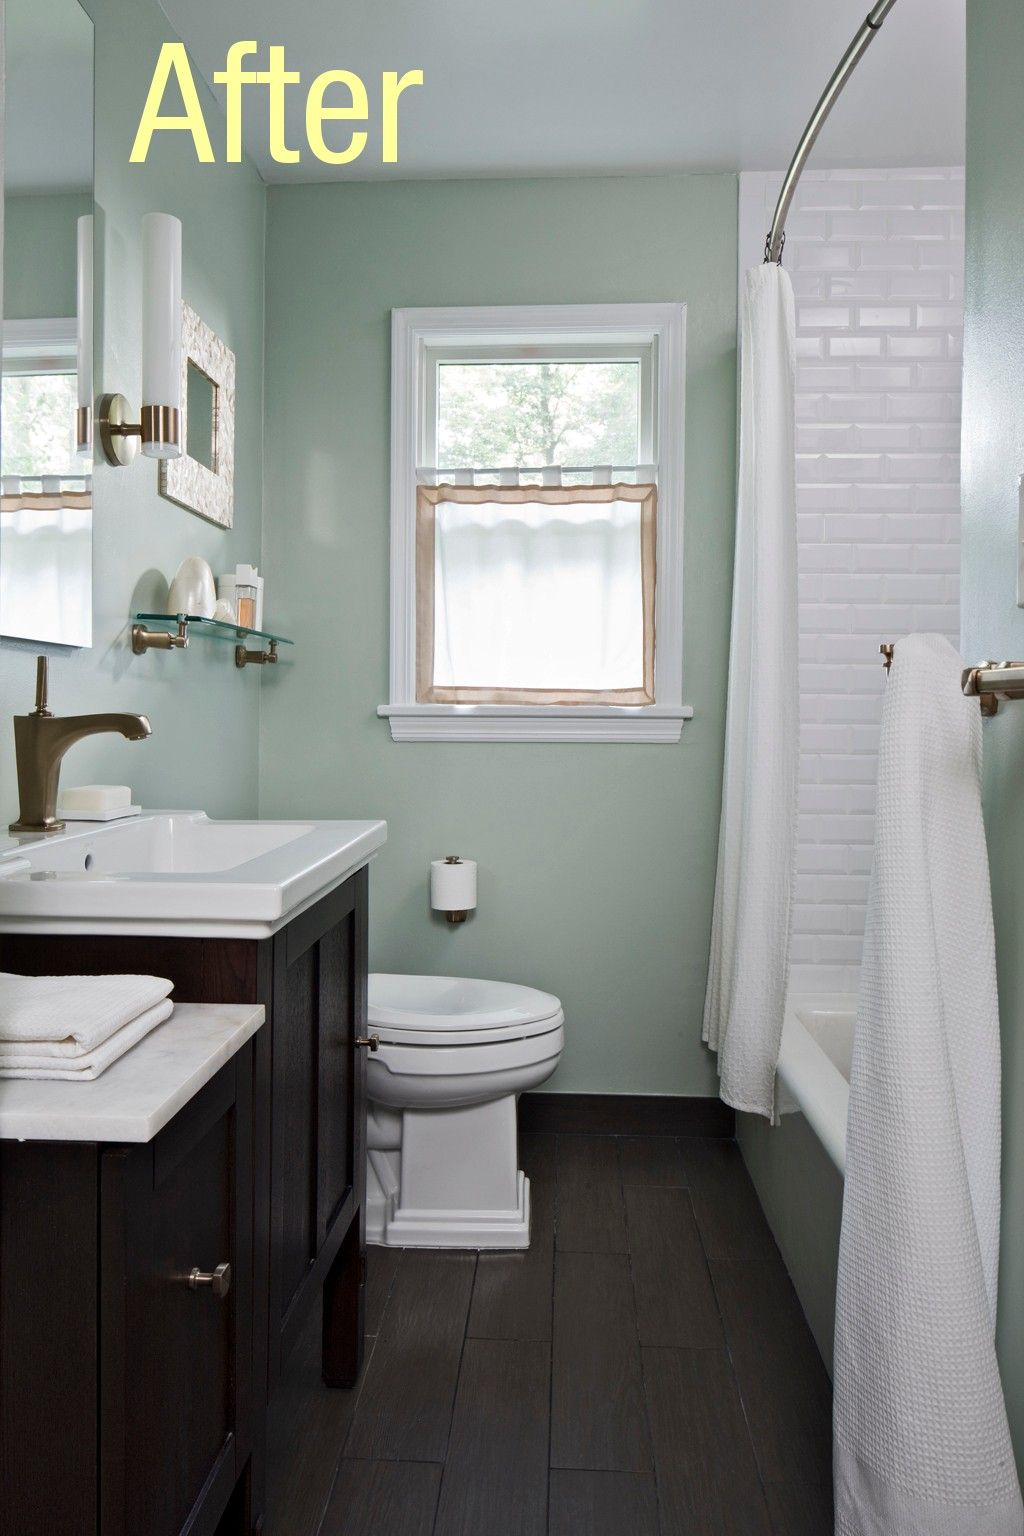 Best Paint Color For Dark Tile Bathroom